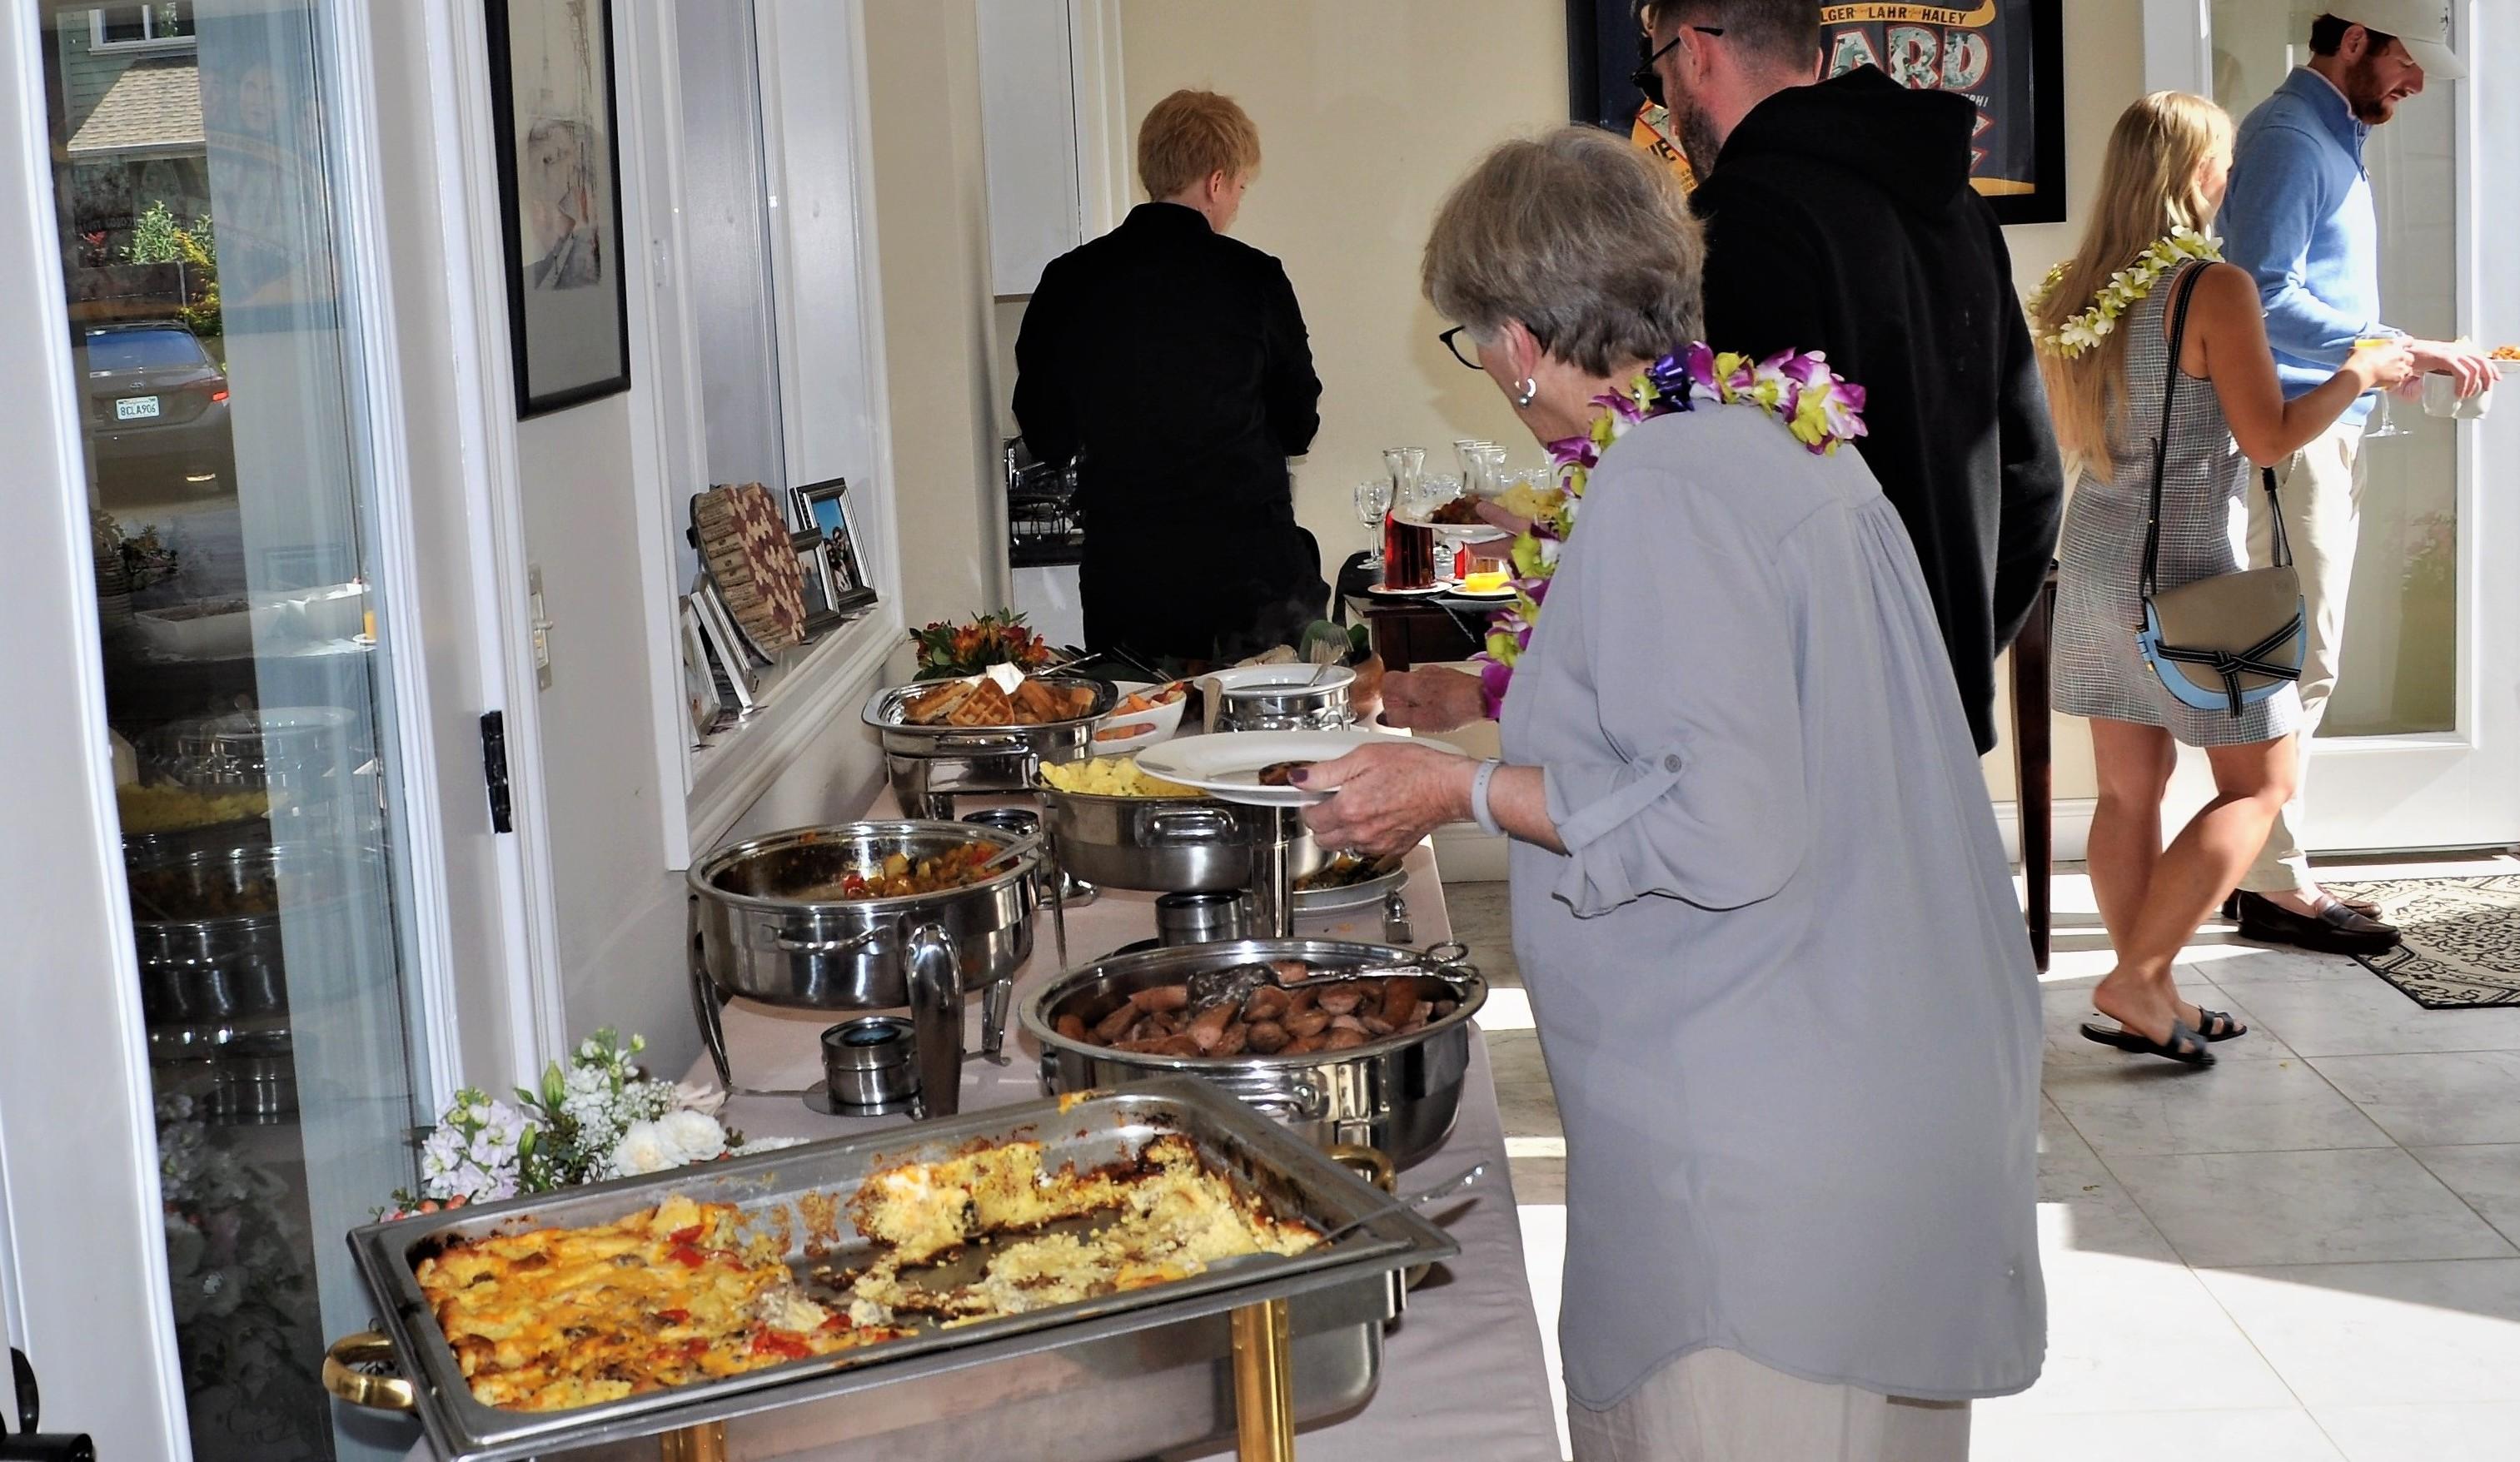 RBI Easter Breakfast Buffet